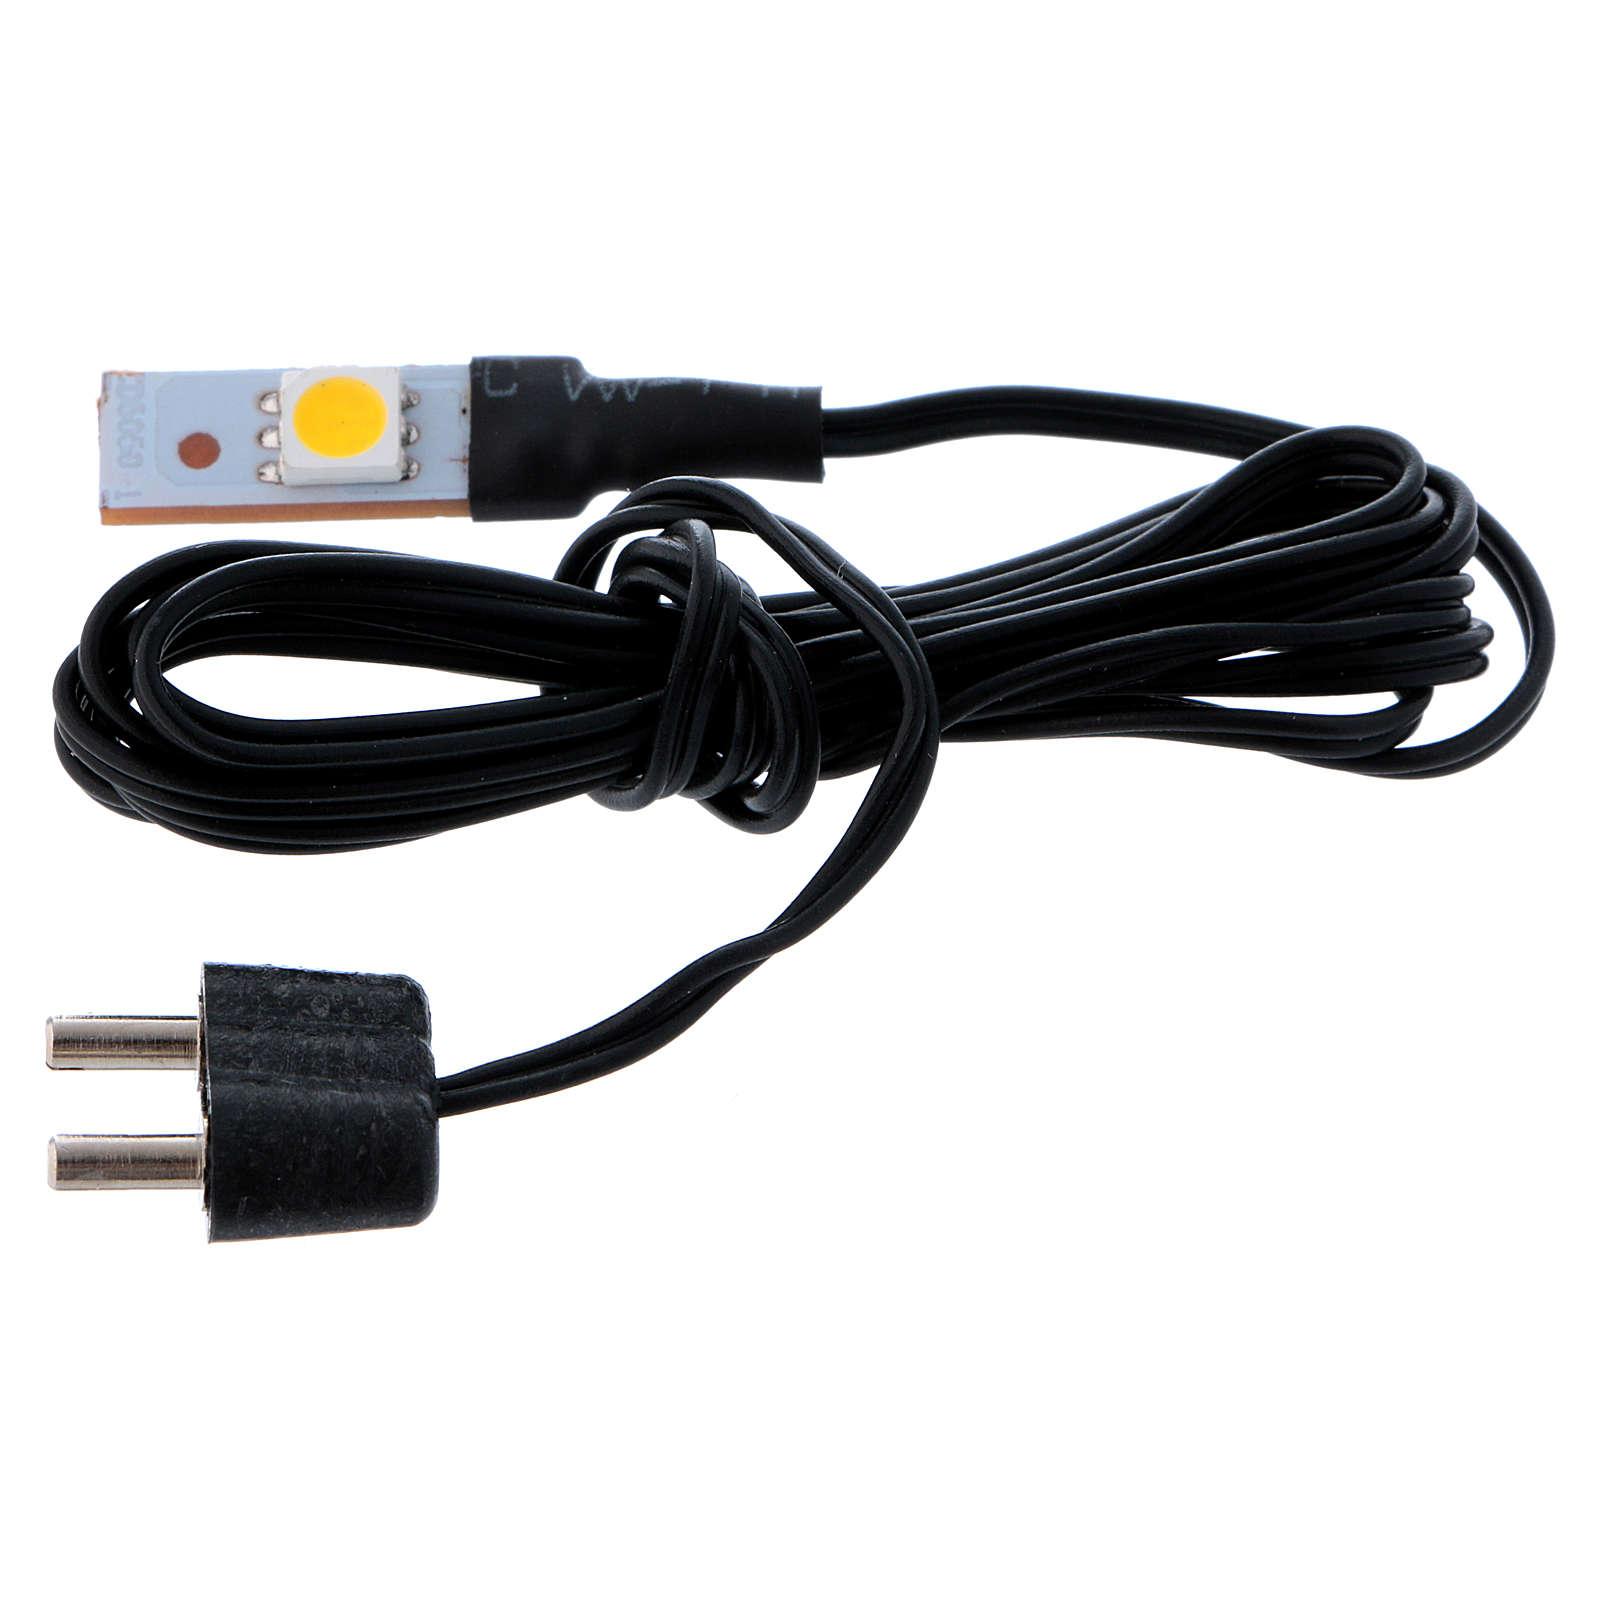 White LED single flat low voltage 4